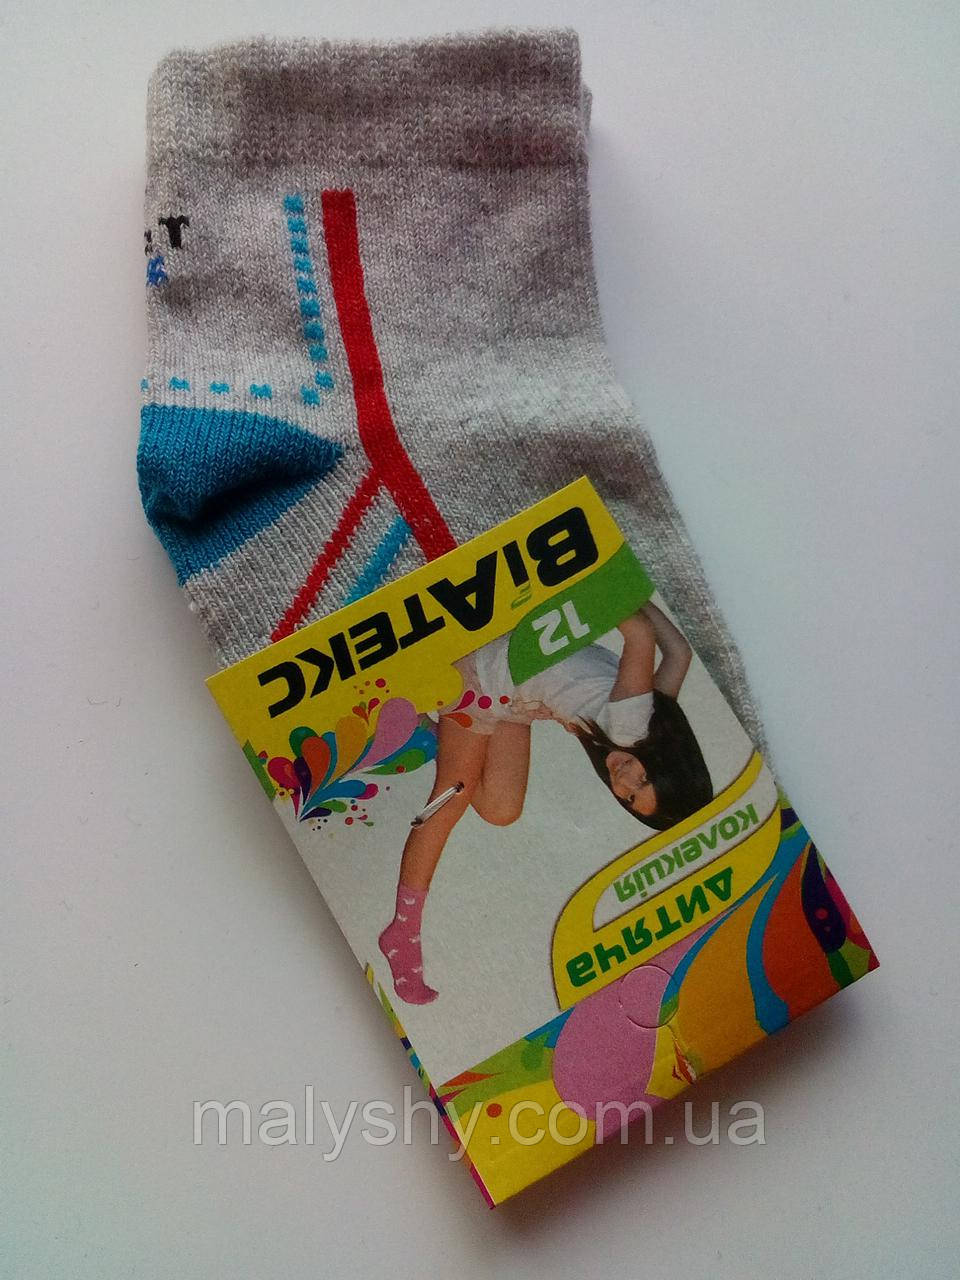 Детские носки демисезонные - ВиАтекс р.12 (шкарпетки дитячі, ВіАтекс)